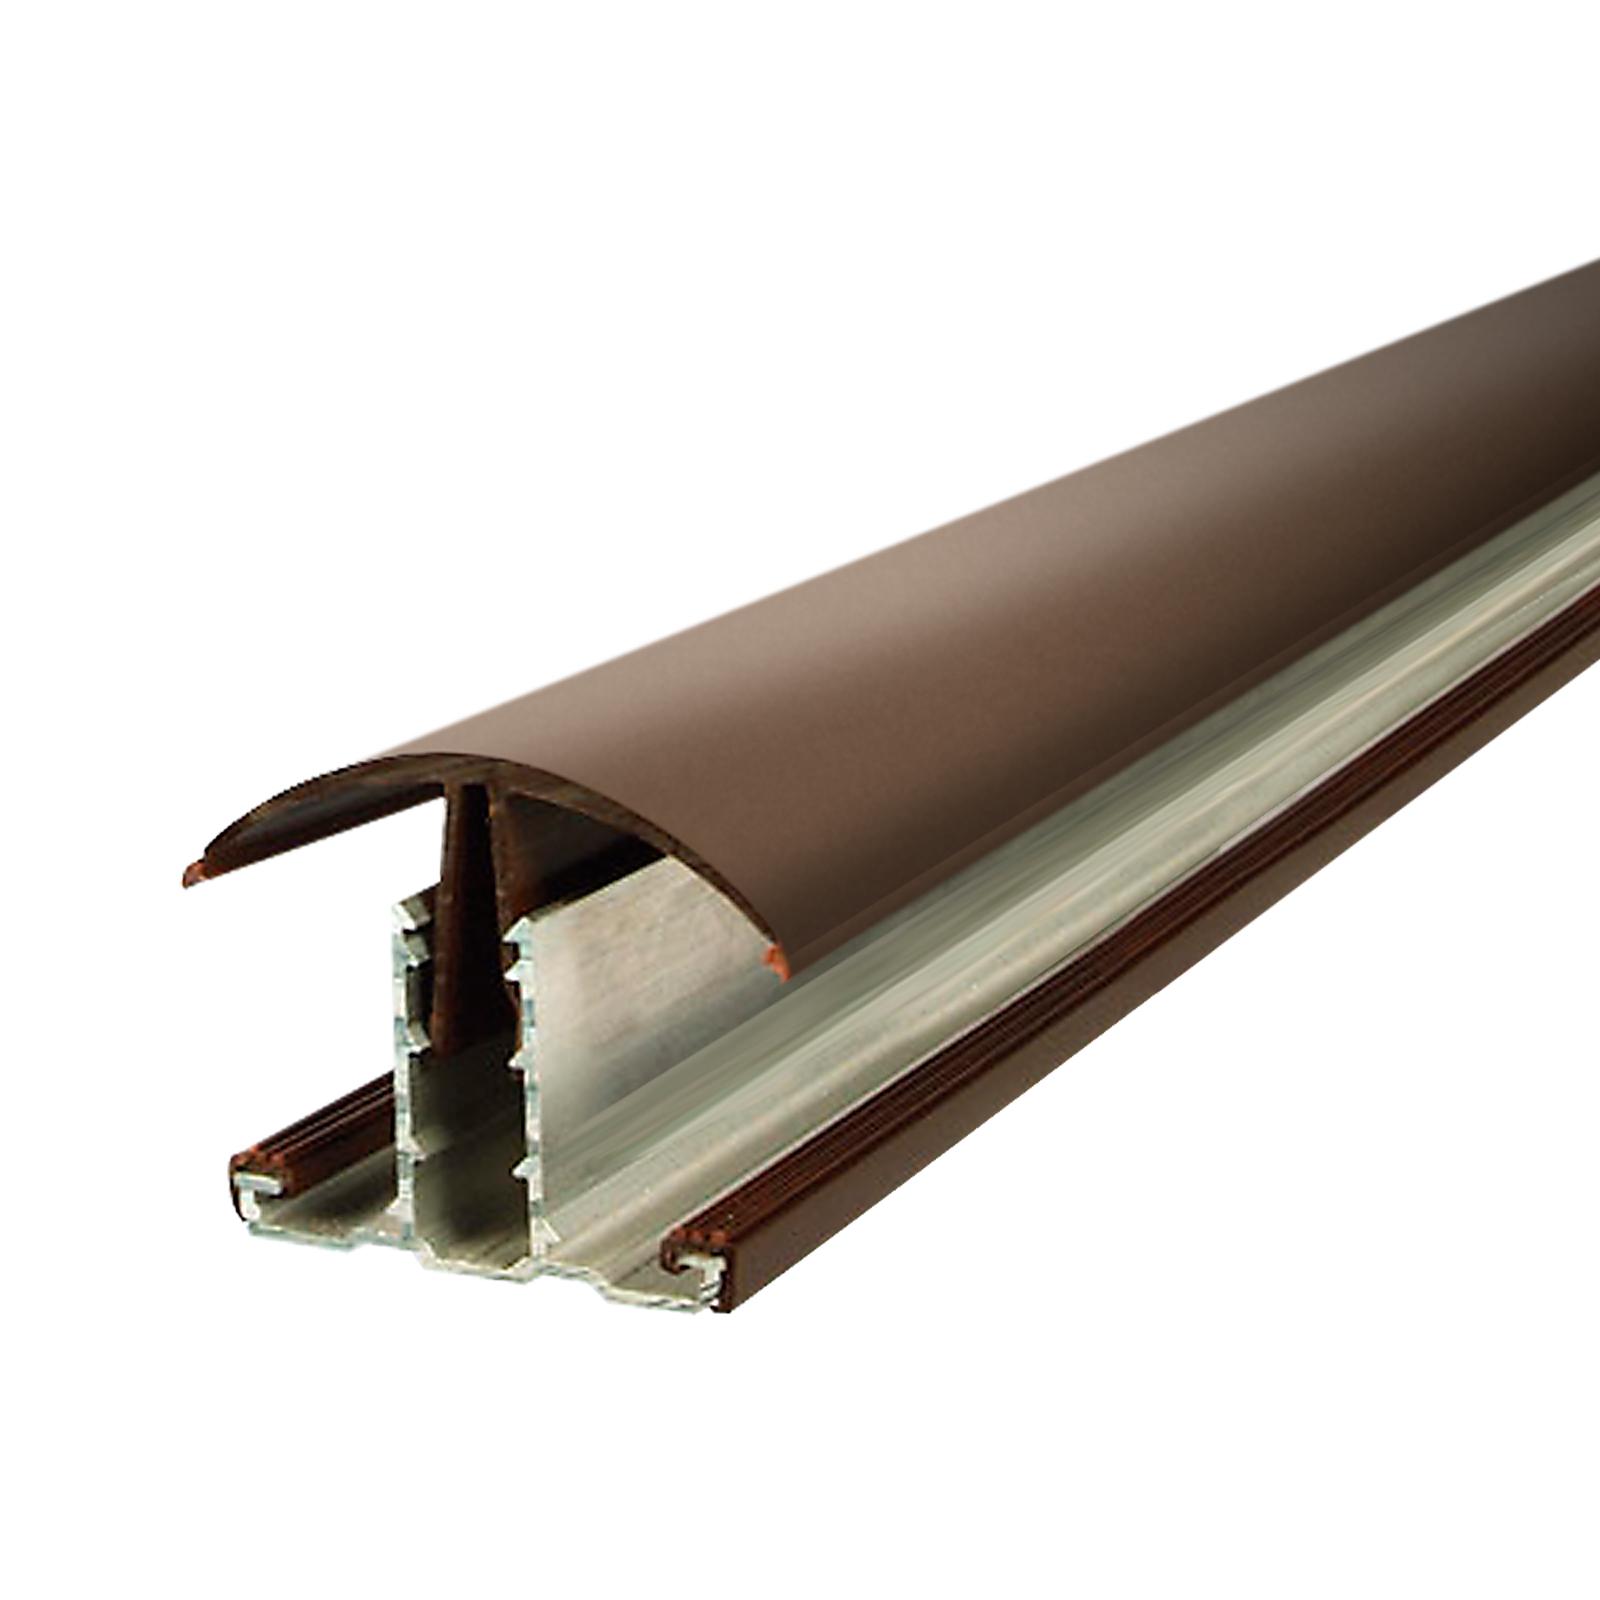 Sunwood Snap Tight 25gb Glazing Hip Bar For Polycarbonate